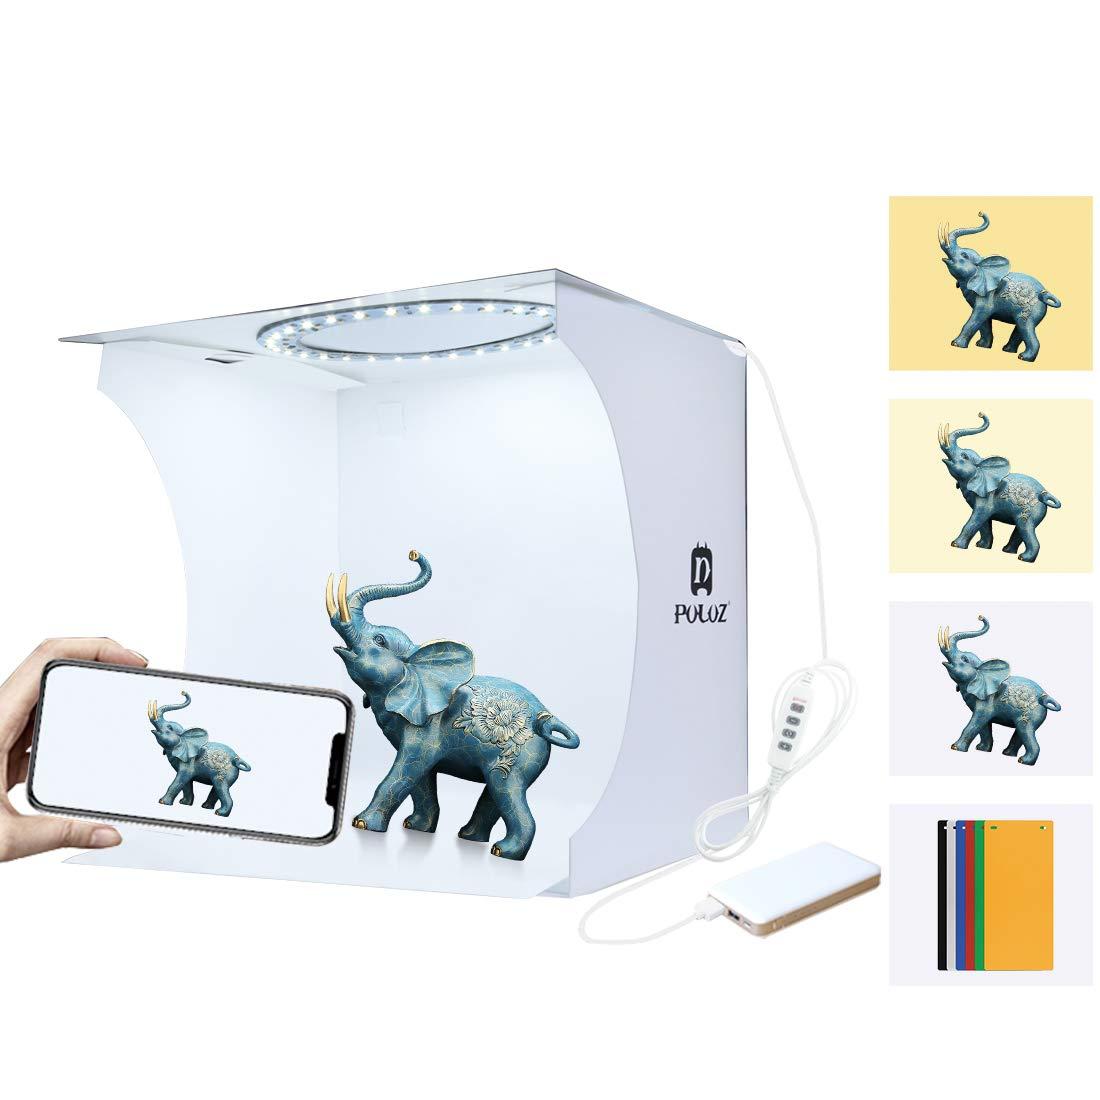 Mini Ring Lightbox Folding Portable Photo Studio Box Photography Softbox Light Box Studio Shooting Tent Box Kit with 6 Backdrops by CAMOLO